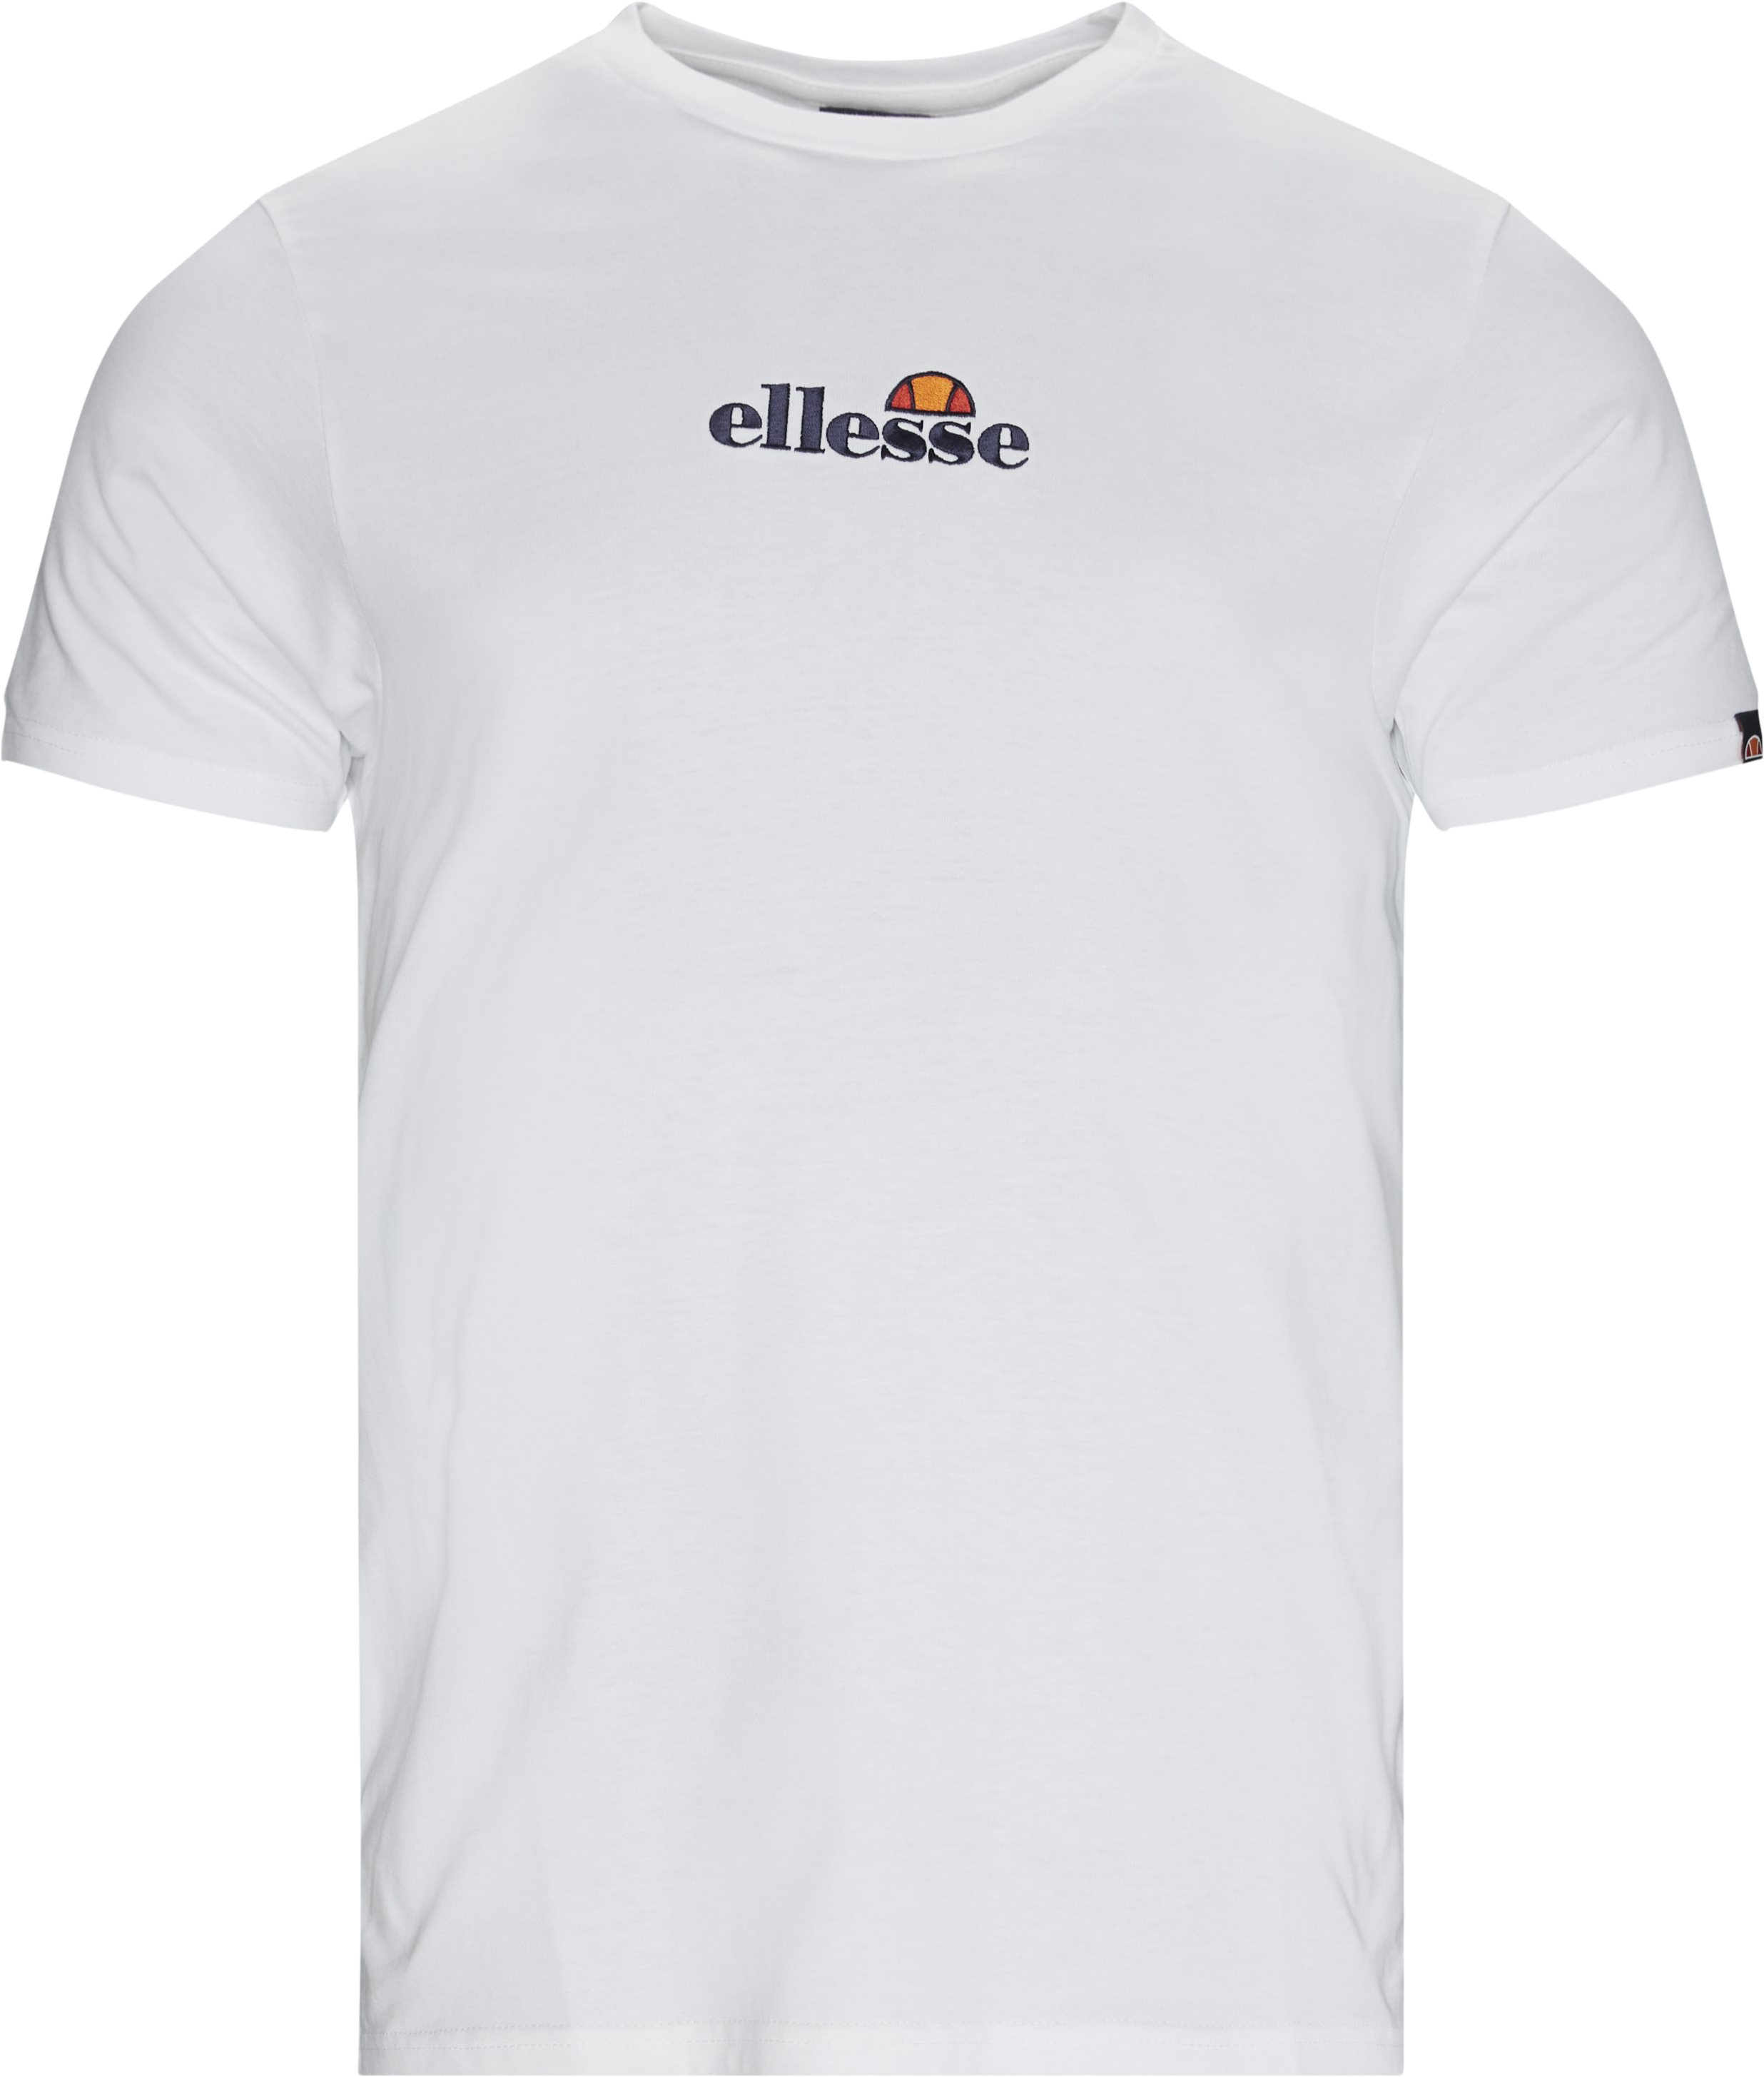 Cacio T-Shirt - T-shirts - Regular fit - Hvid